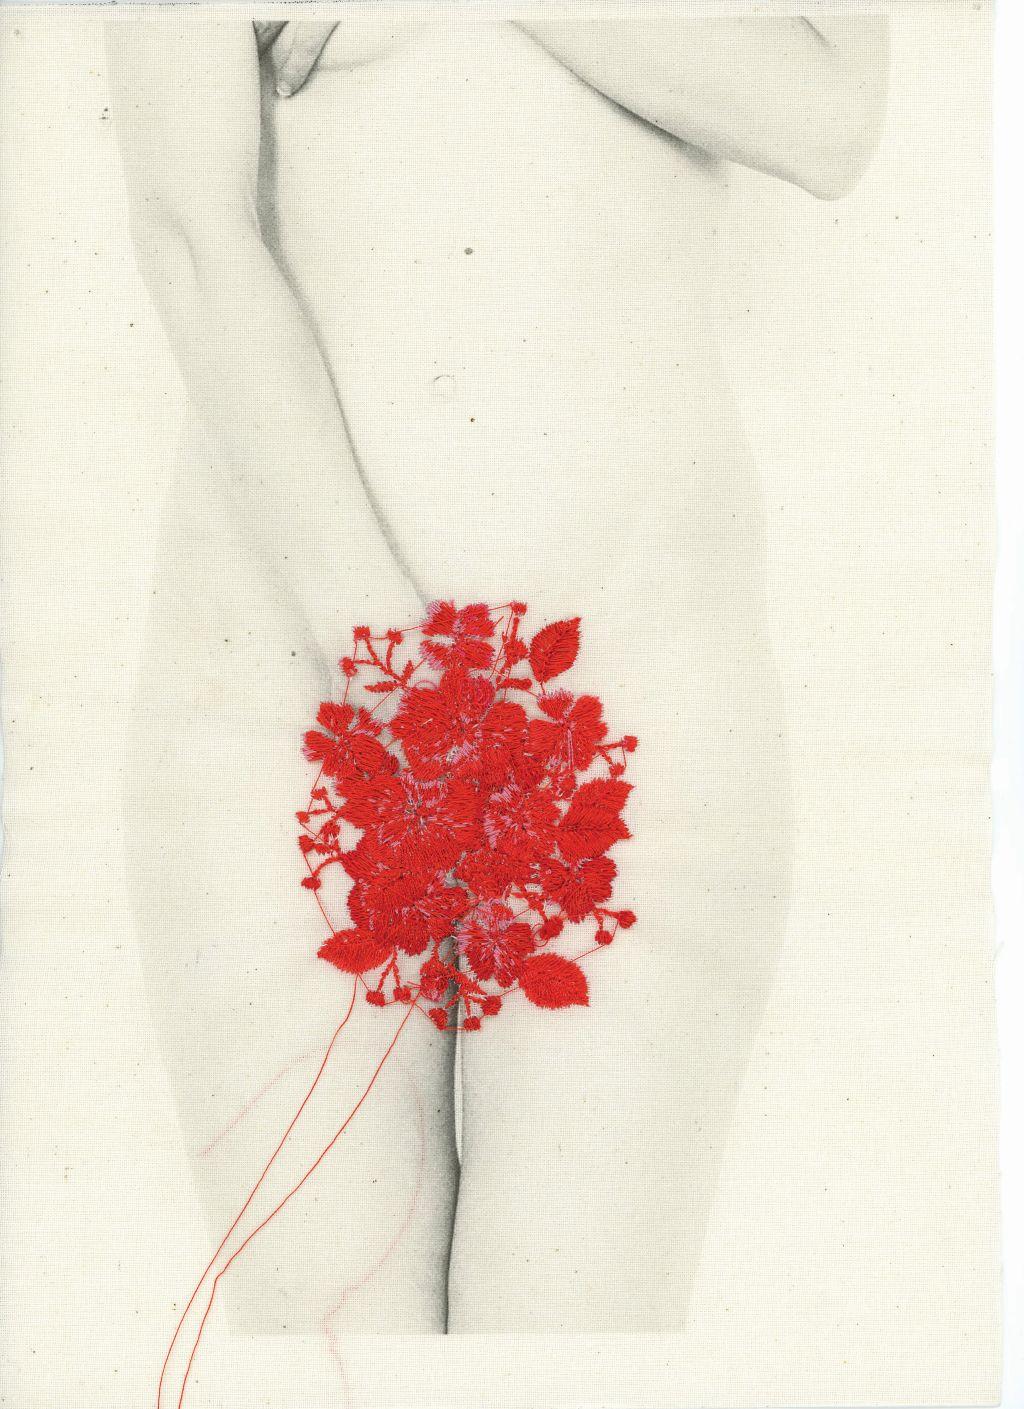 Łono natury, druk na płótnie, haft. 29 x 21 cm, 2014/16